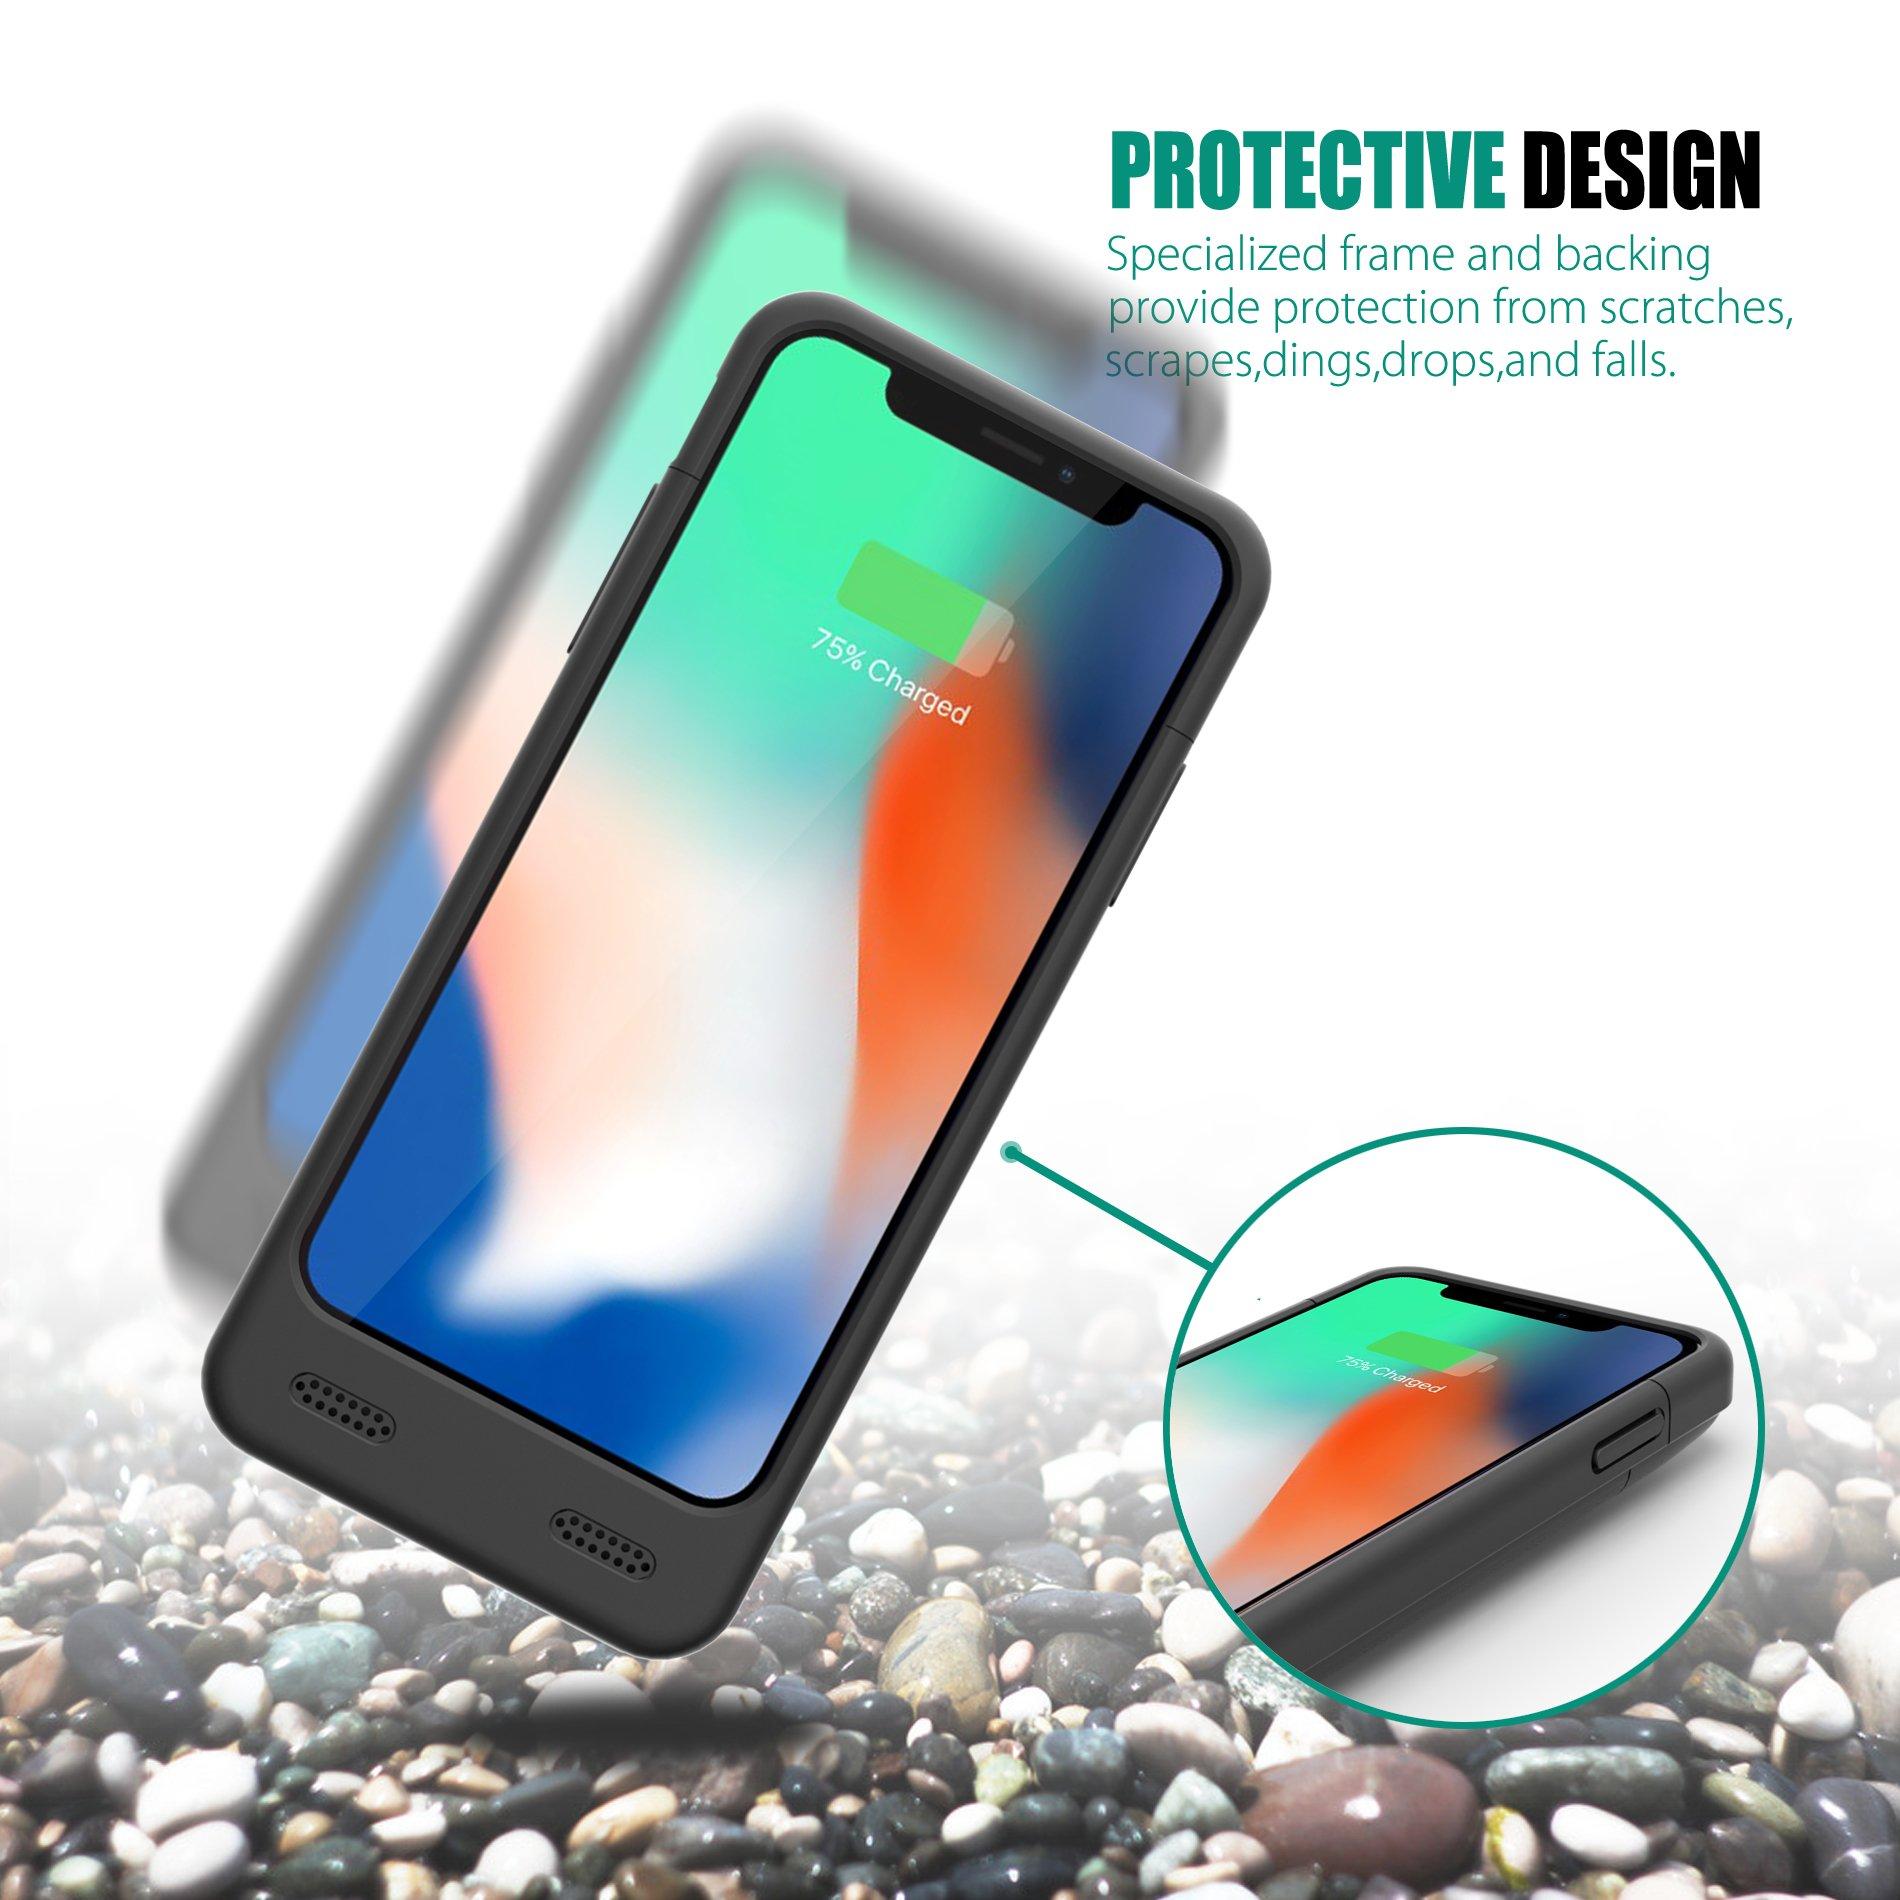 promo code b7f1e d2931 iPhone X Battery Case Version 1.0, ZeroLemon iPhone X 4000mAh Slim Juicer  Extended Battery Case Rechargeable Charging Case for iPhone X [Apple ...